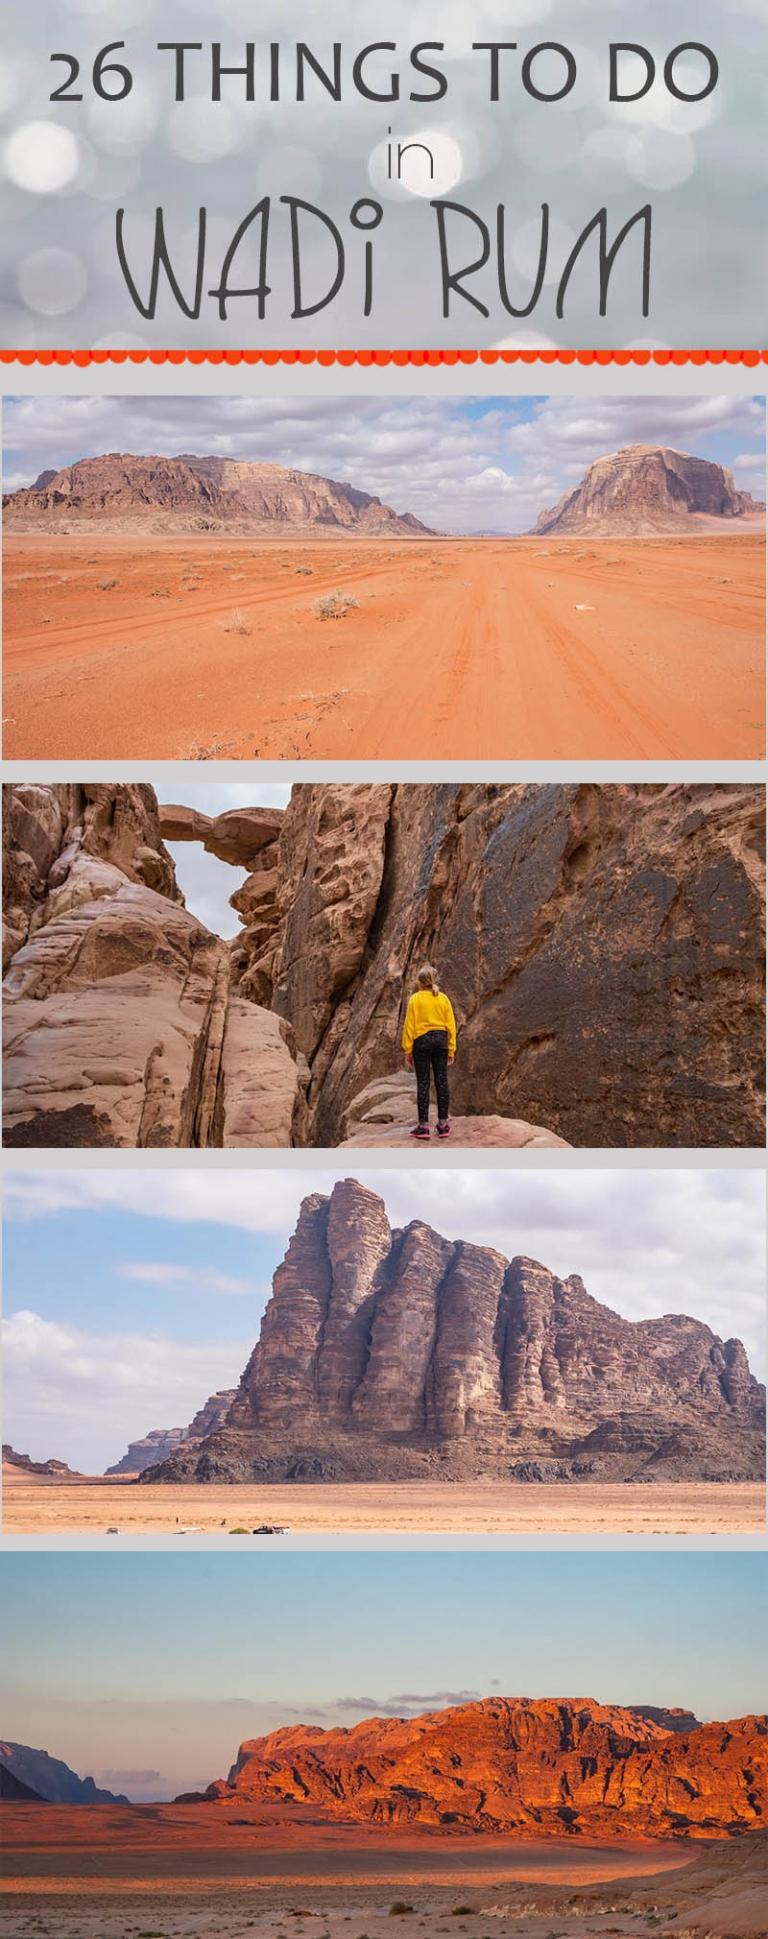 26 things you can do in Wadi Rum from Um sabatah Camp